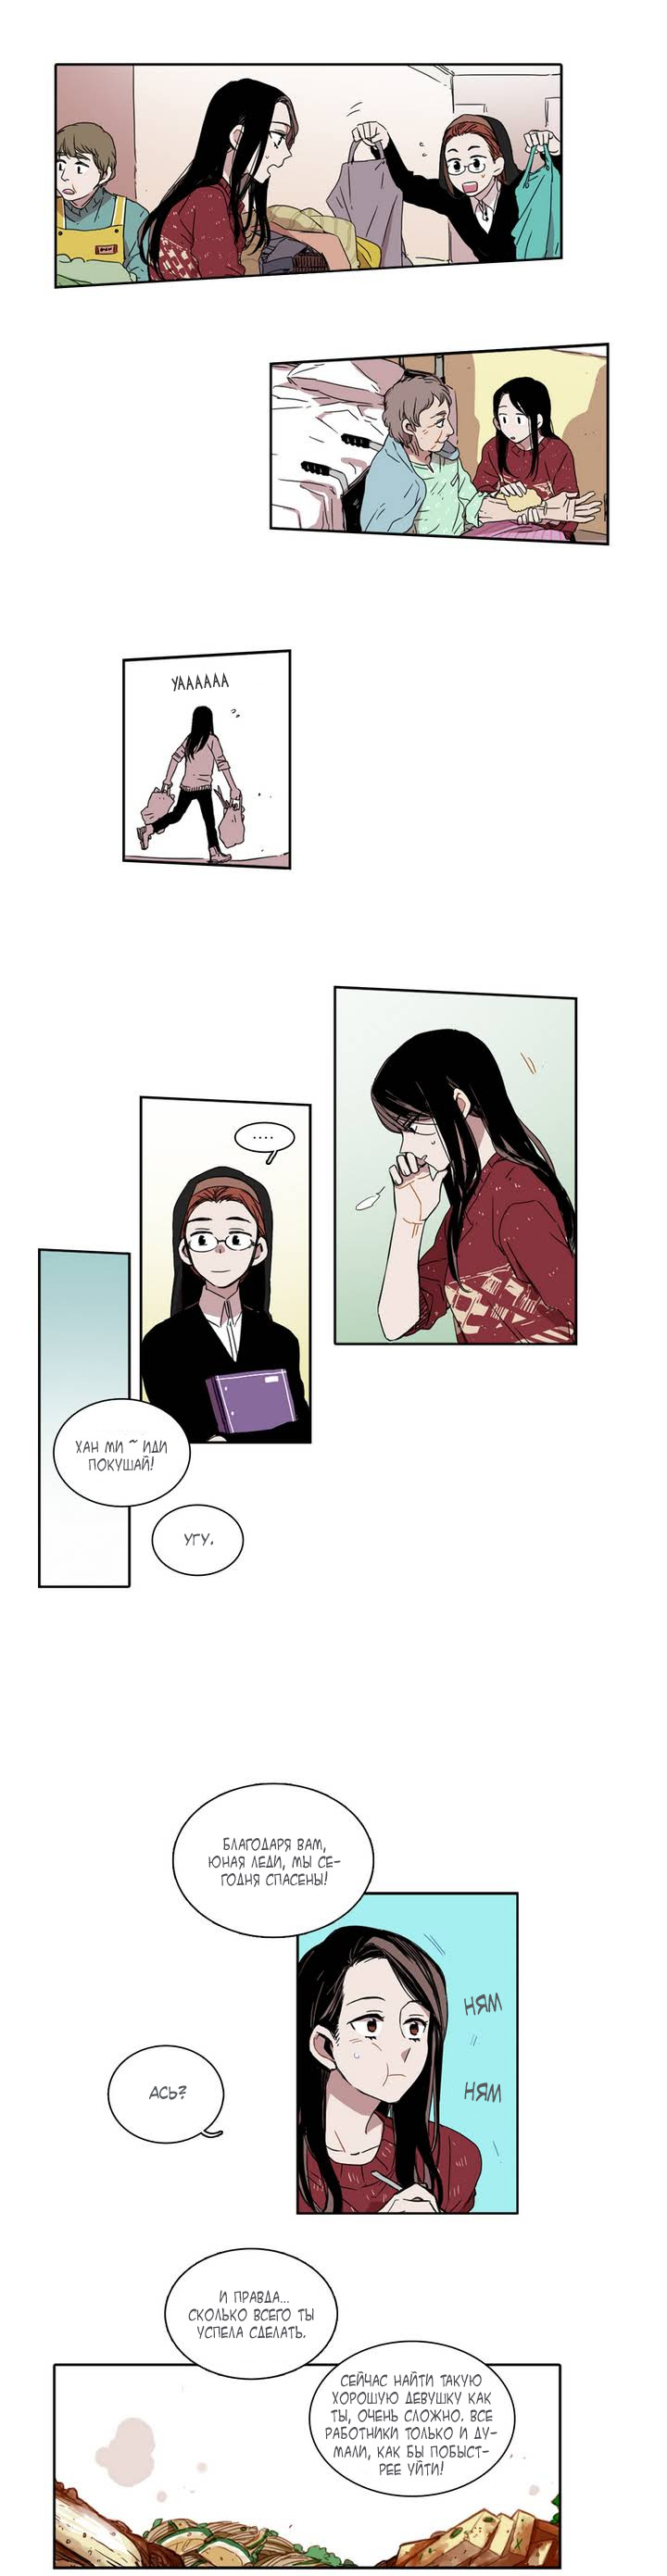 https://r1.ninemanga.com/comics/pic2/24/19800/286723/145792186967.jpg Page 4